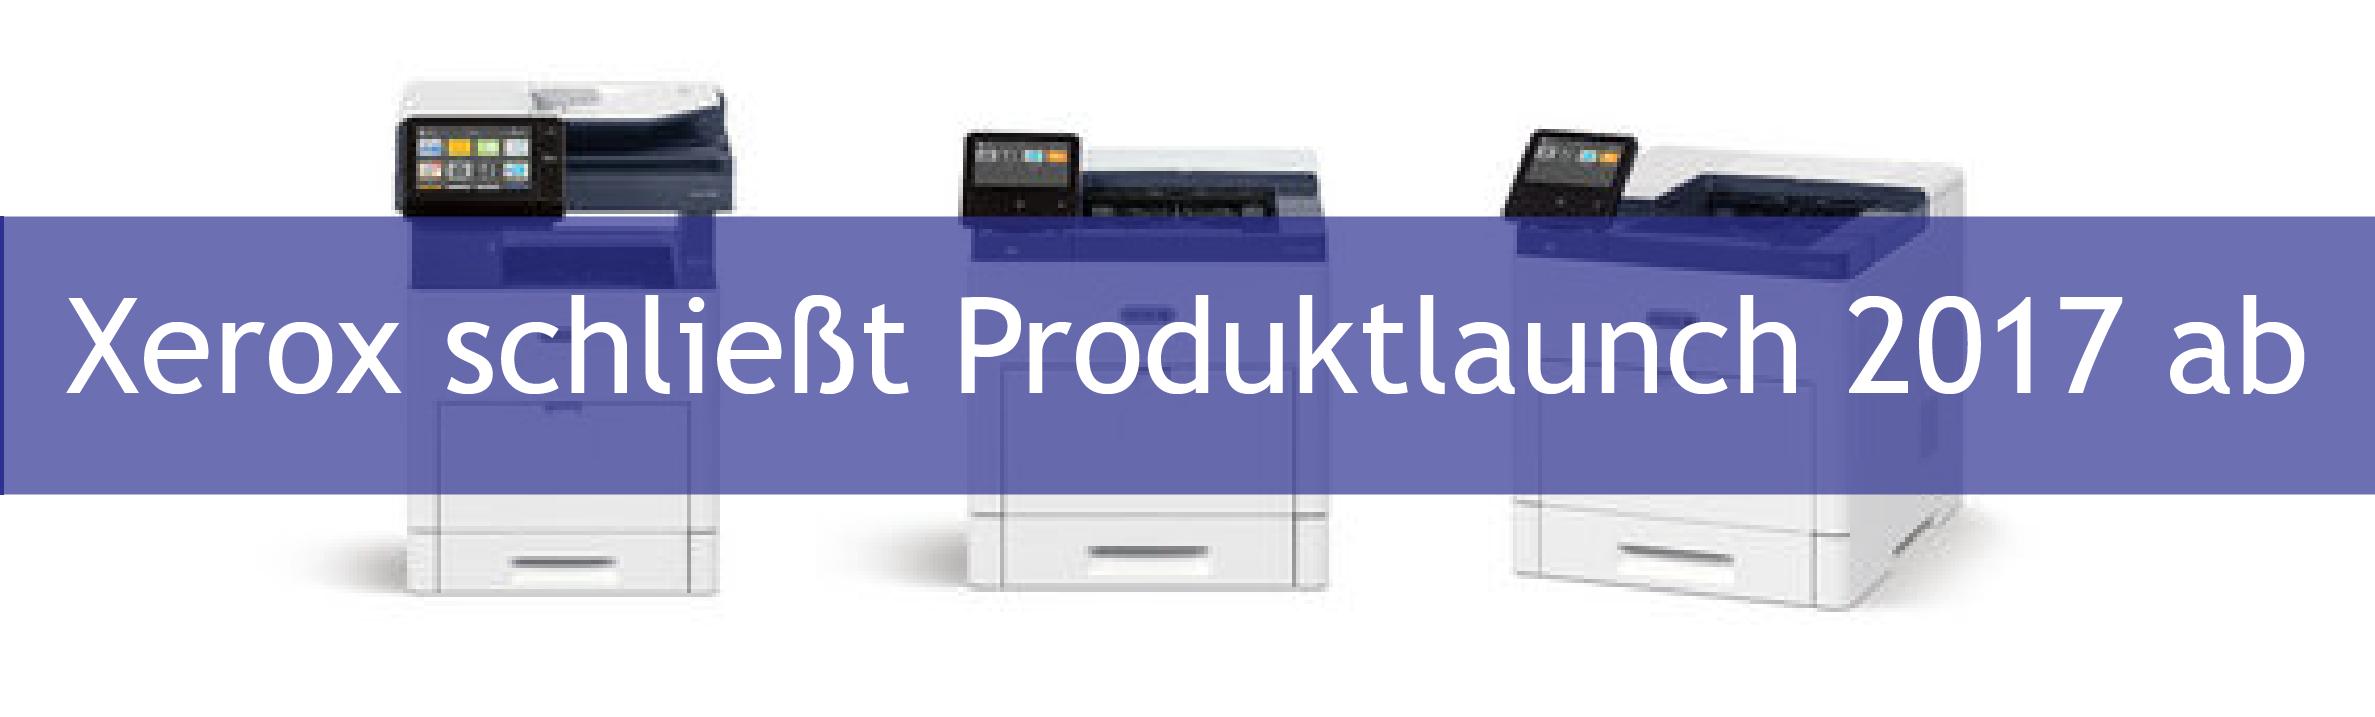 Xerox schließt Produktlaunch 2017 ab